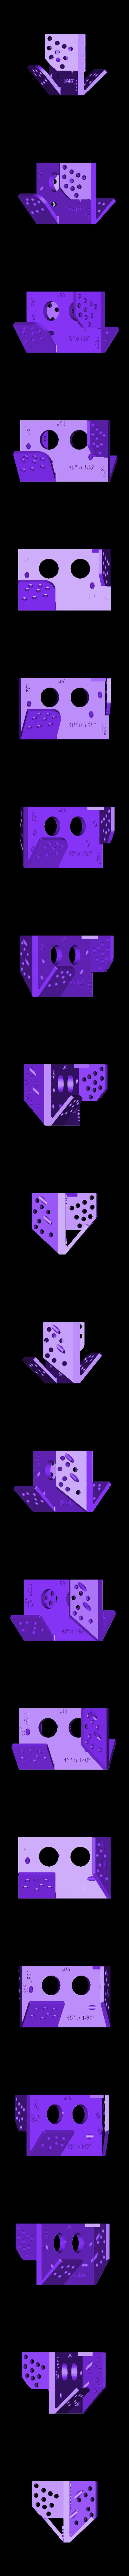 montura_multi%C3%A1ngulo_stl.STL Download free STL file Mounting for HC SR04 Multi-Angle (40°,90°,140°,45°,135°,105°,120°, 75° and 60°) • 3D printer object, memoretirado